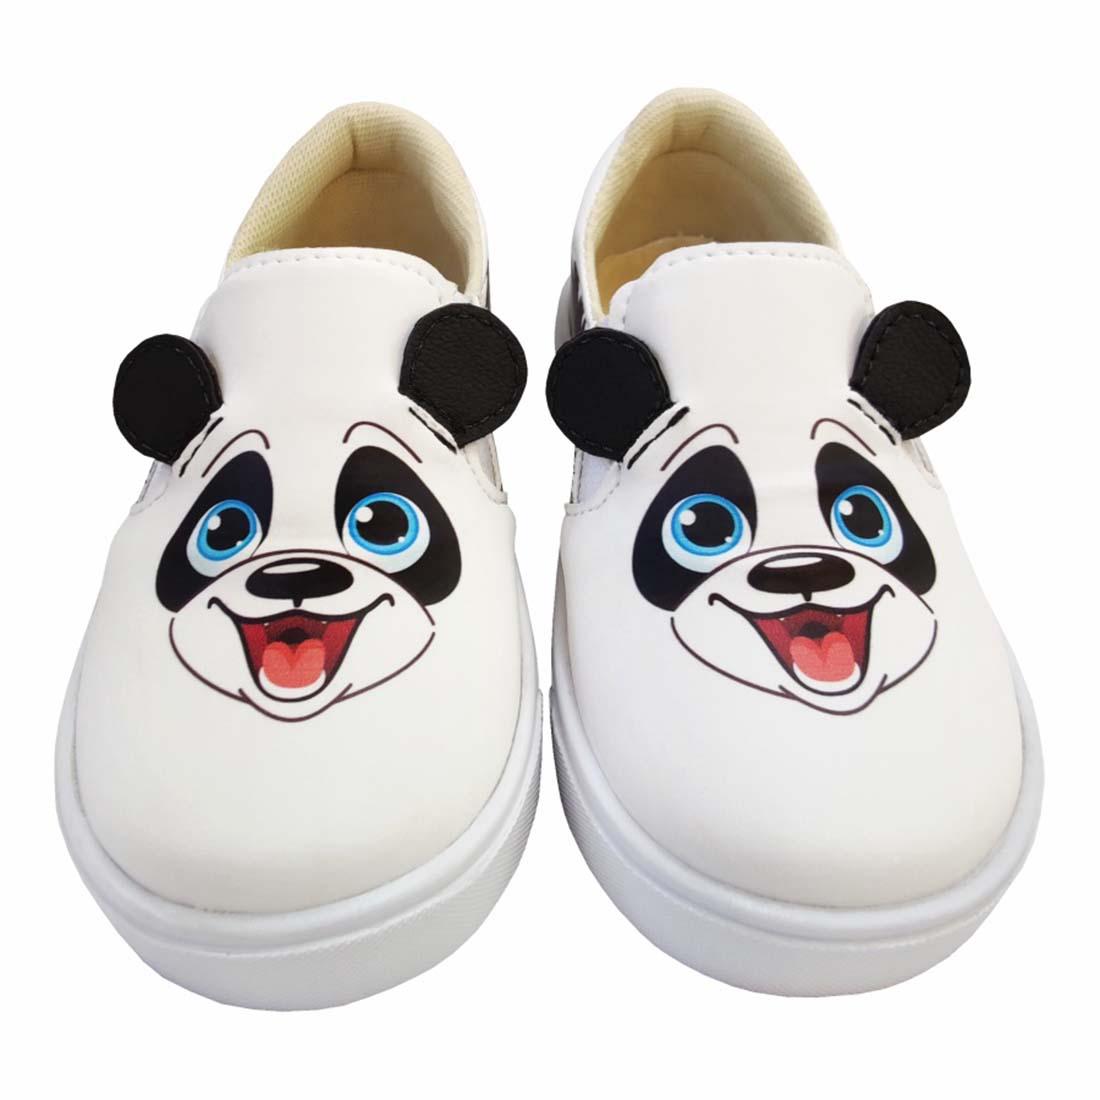 Kit Infantil Bolsa, Tênis e Estojo Panda Feliz, Magicc Kids